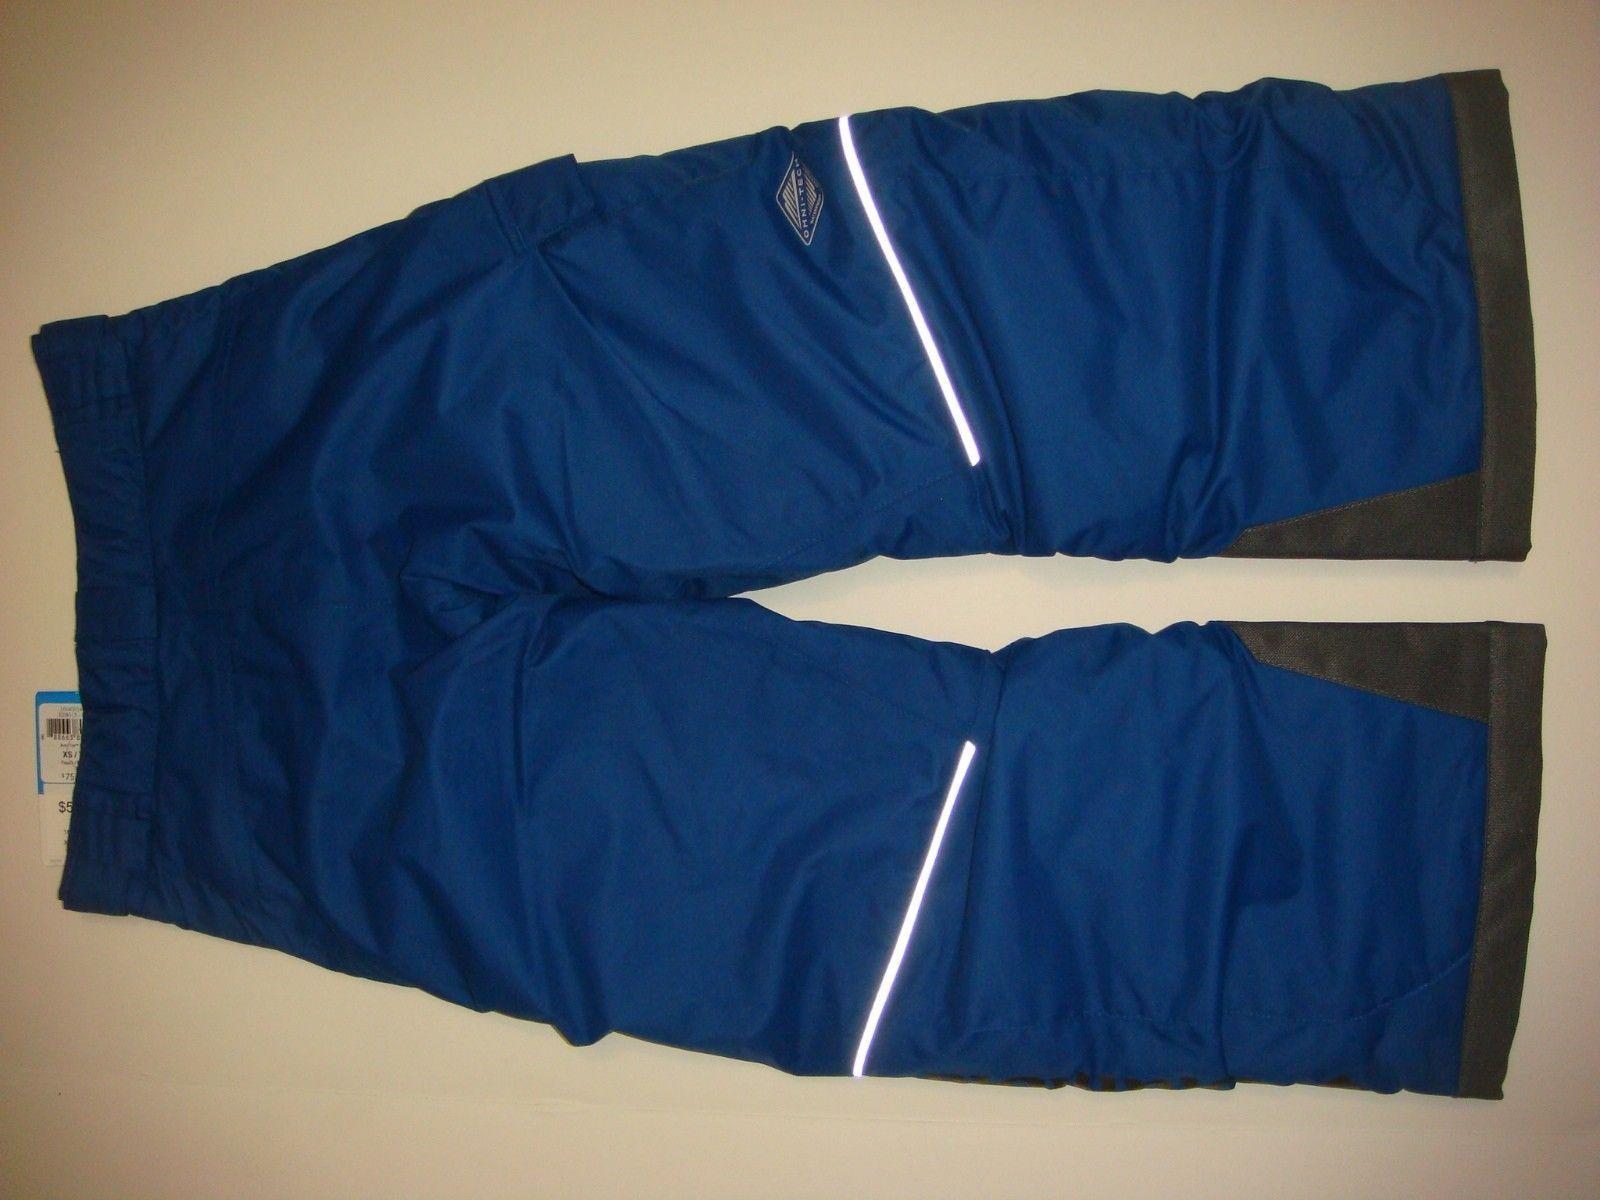 COLUMBIA youth BOYS twins SKI SNOW JACKET+PANTS BLUE navy green omni heat XS 6-7